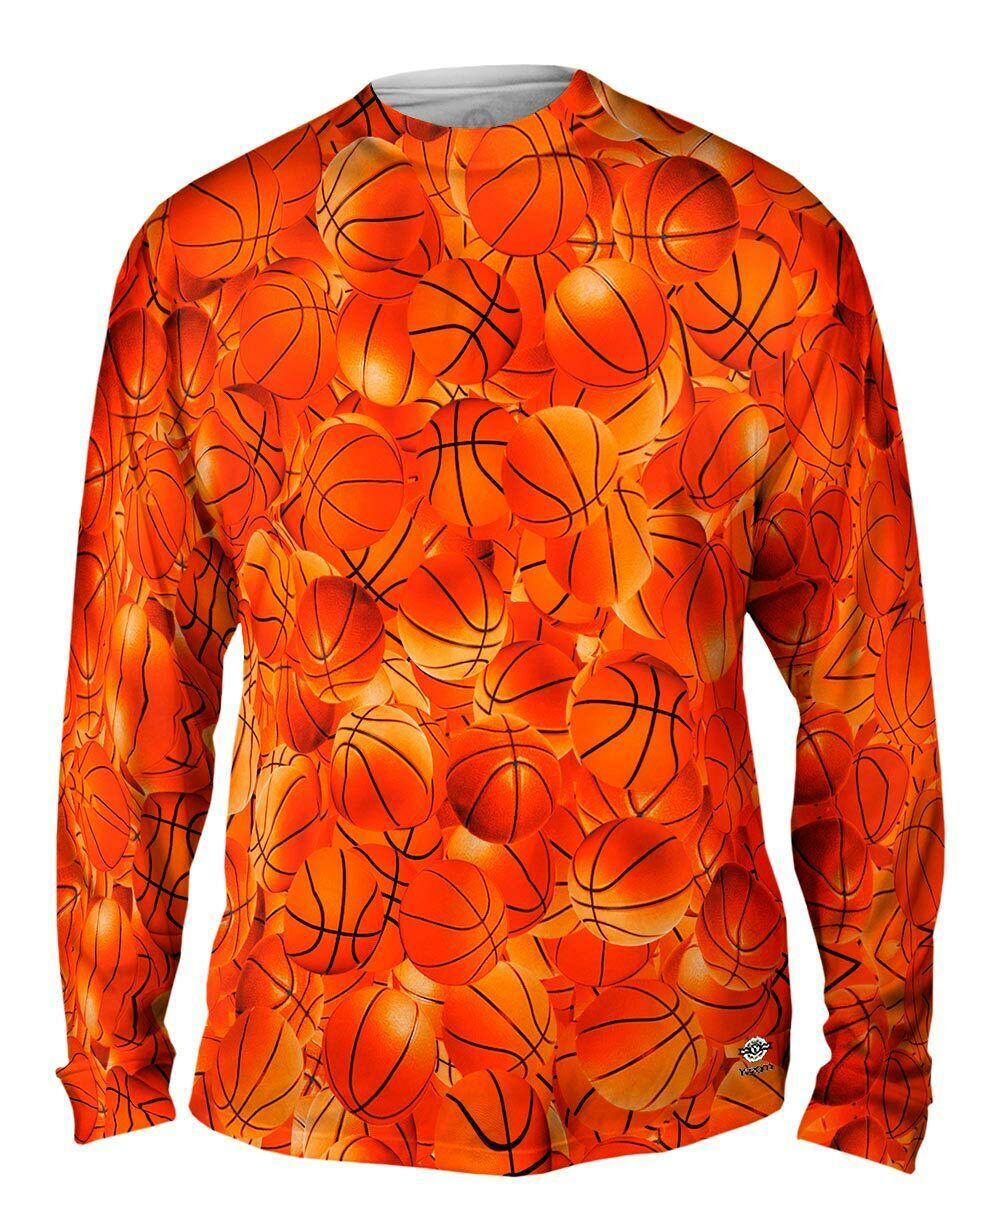 Yizzam- Basketball Pride - New Mens Long Sleeve Tee Shirt XS S M L XL 2XL 3XL 4